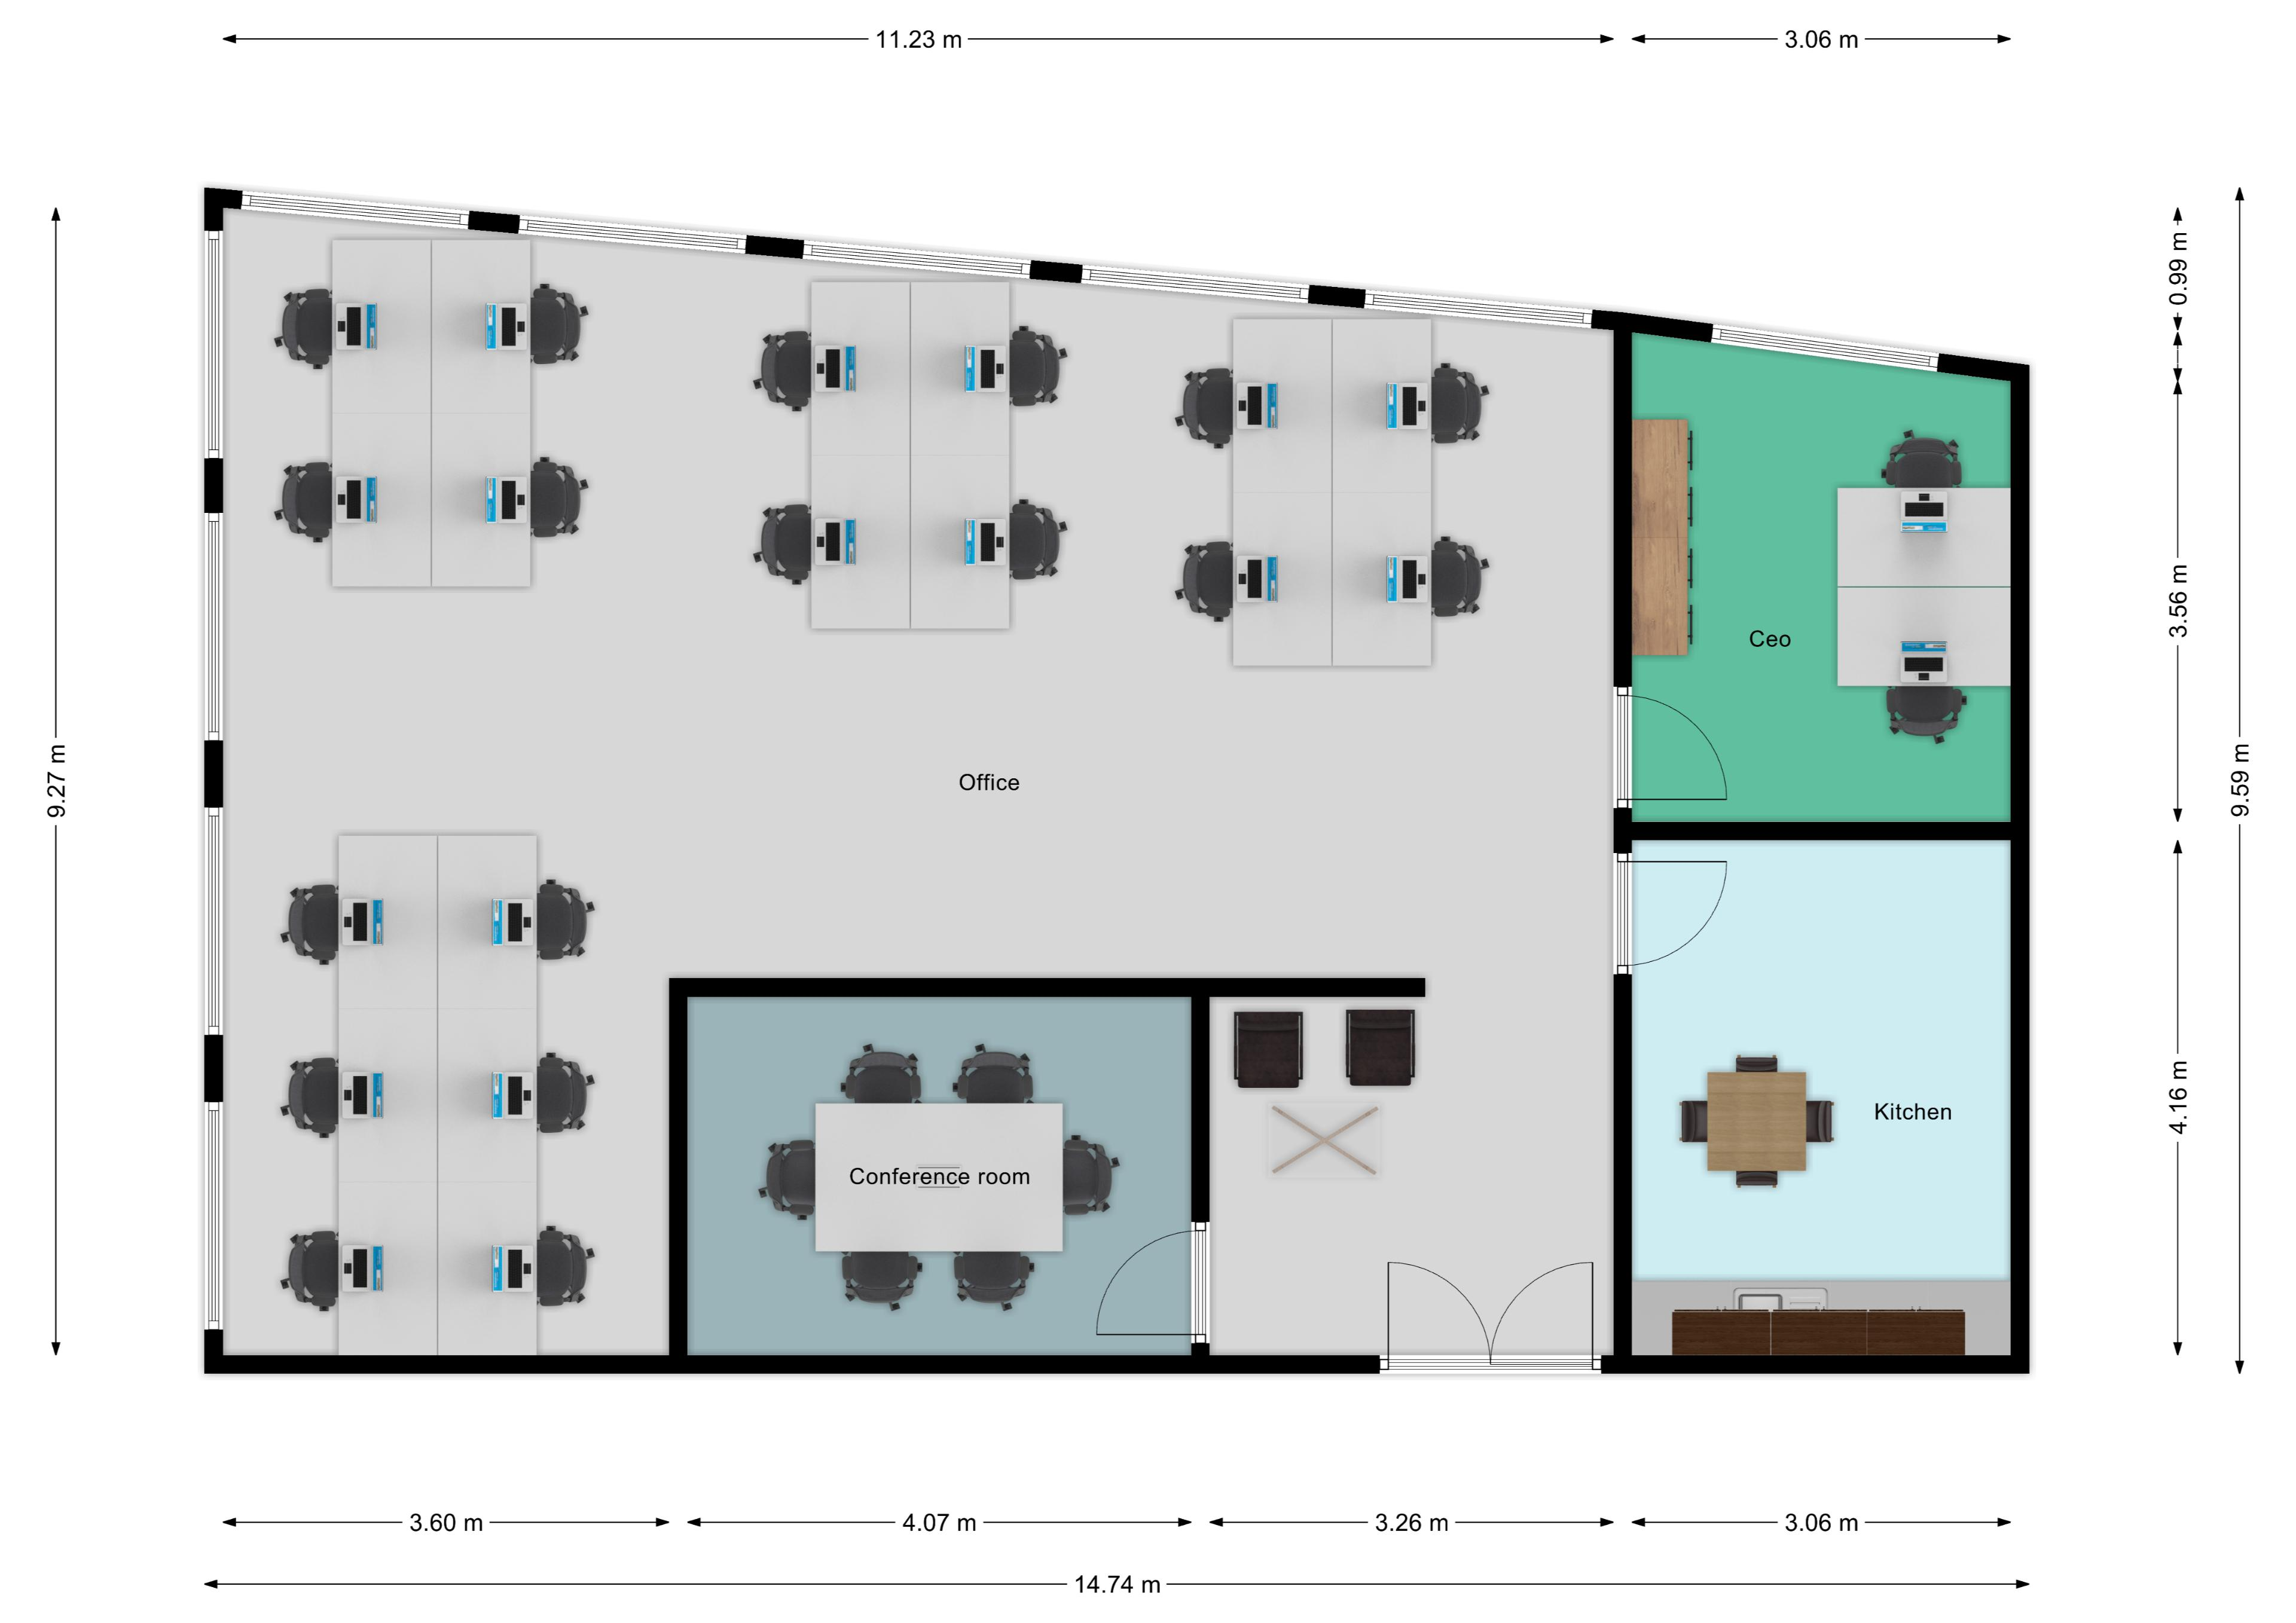 107 Floorplan